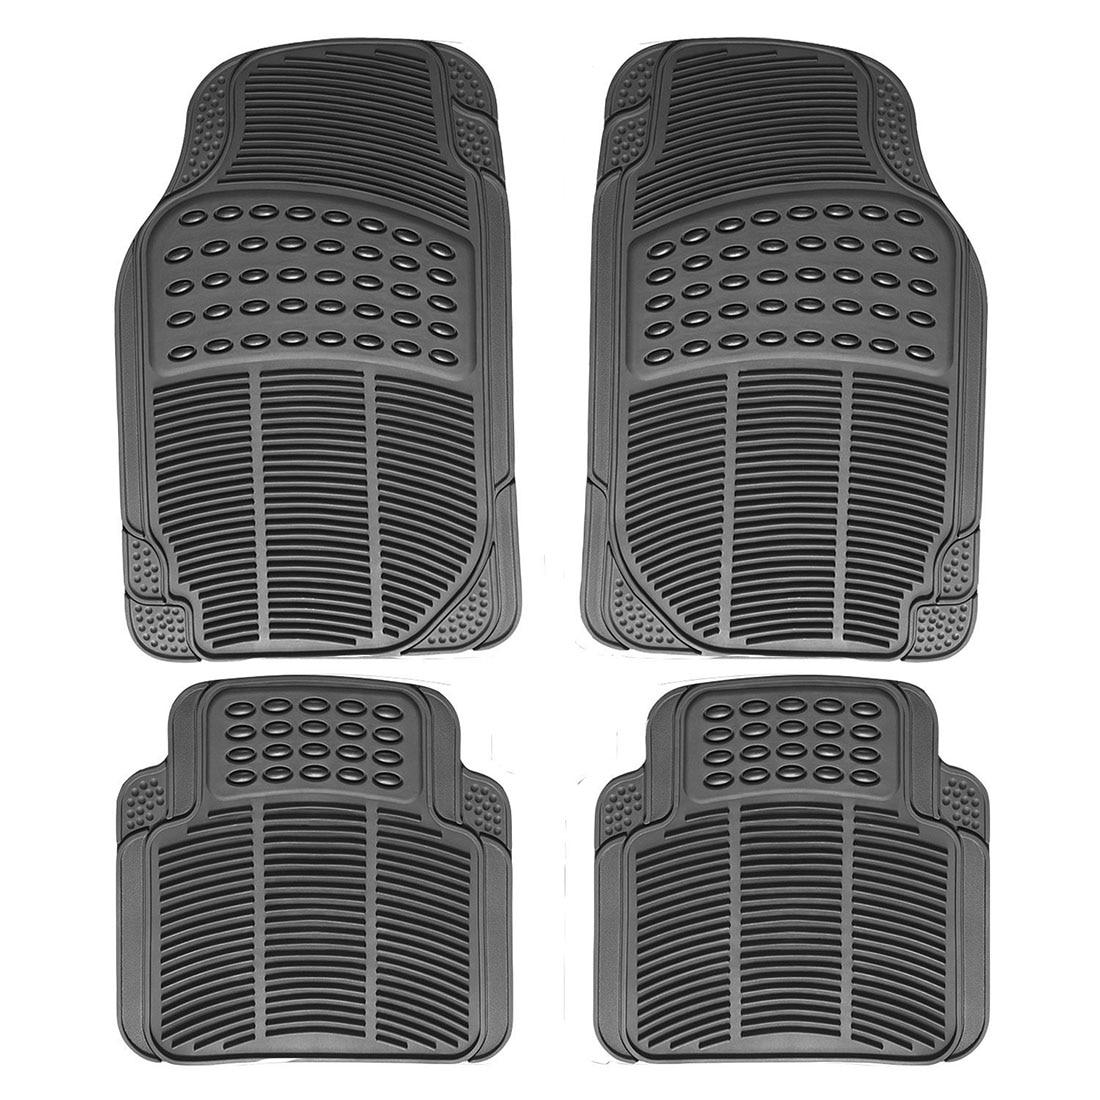 Floor mats jaguar s type - Multi Season Rubber Floor Mats 4pc Set Black Fit Most Cars Suvs Vans And